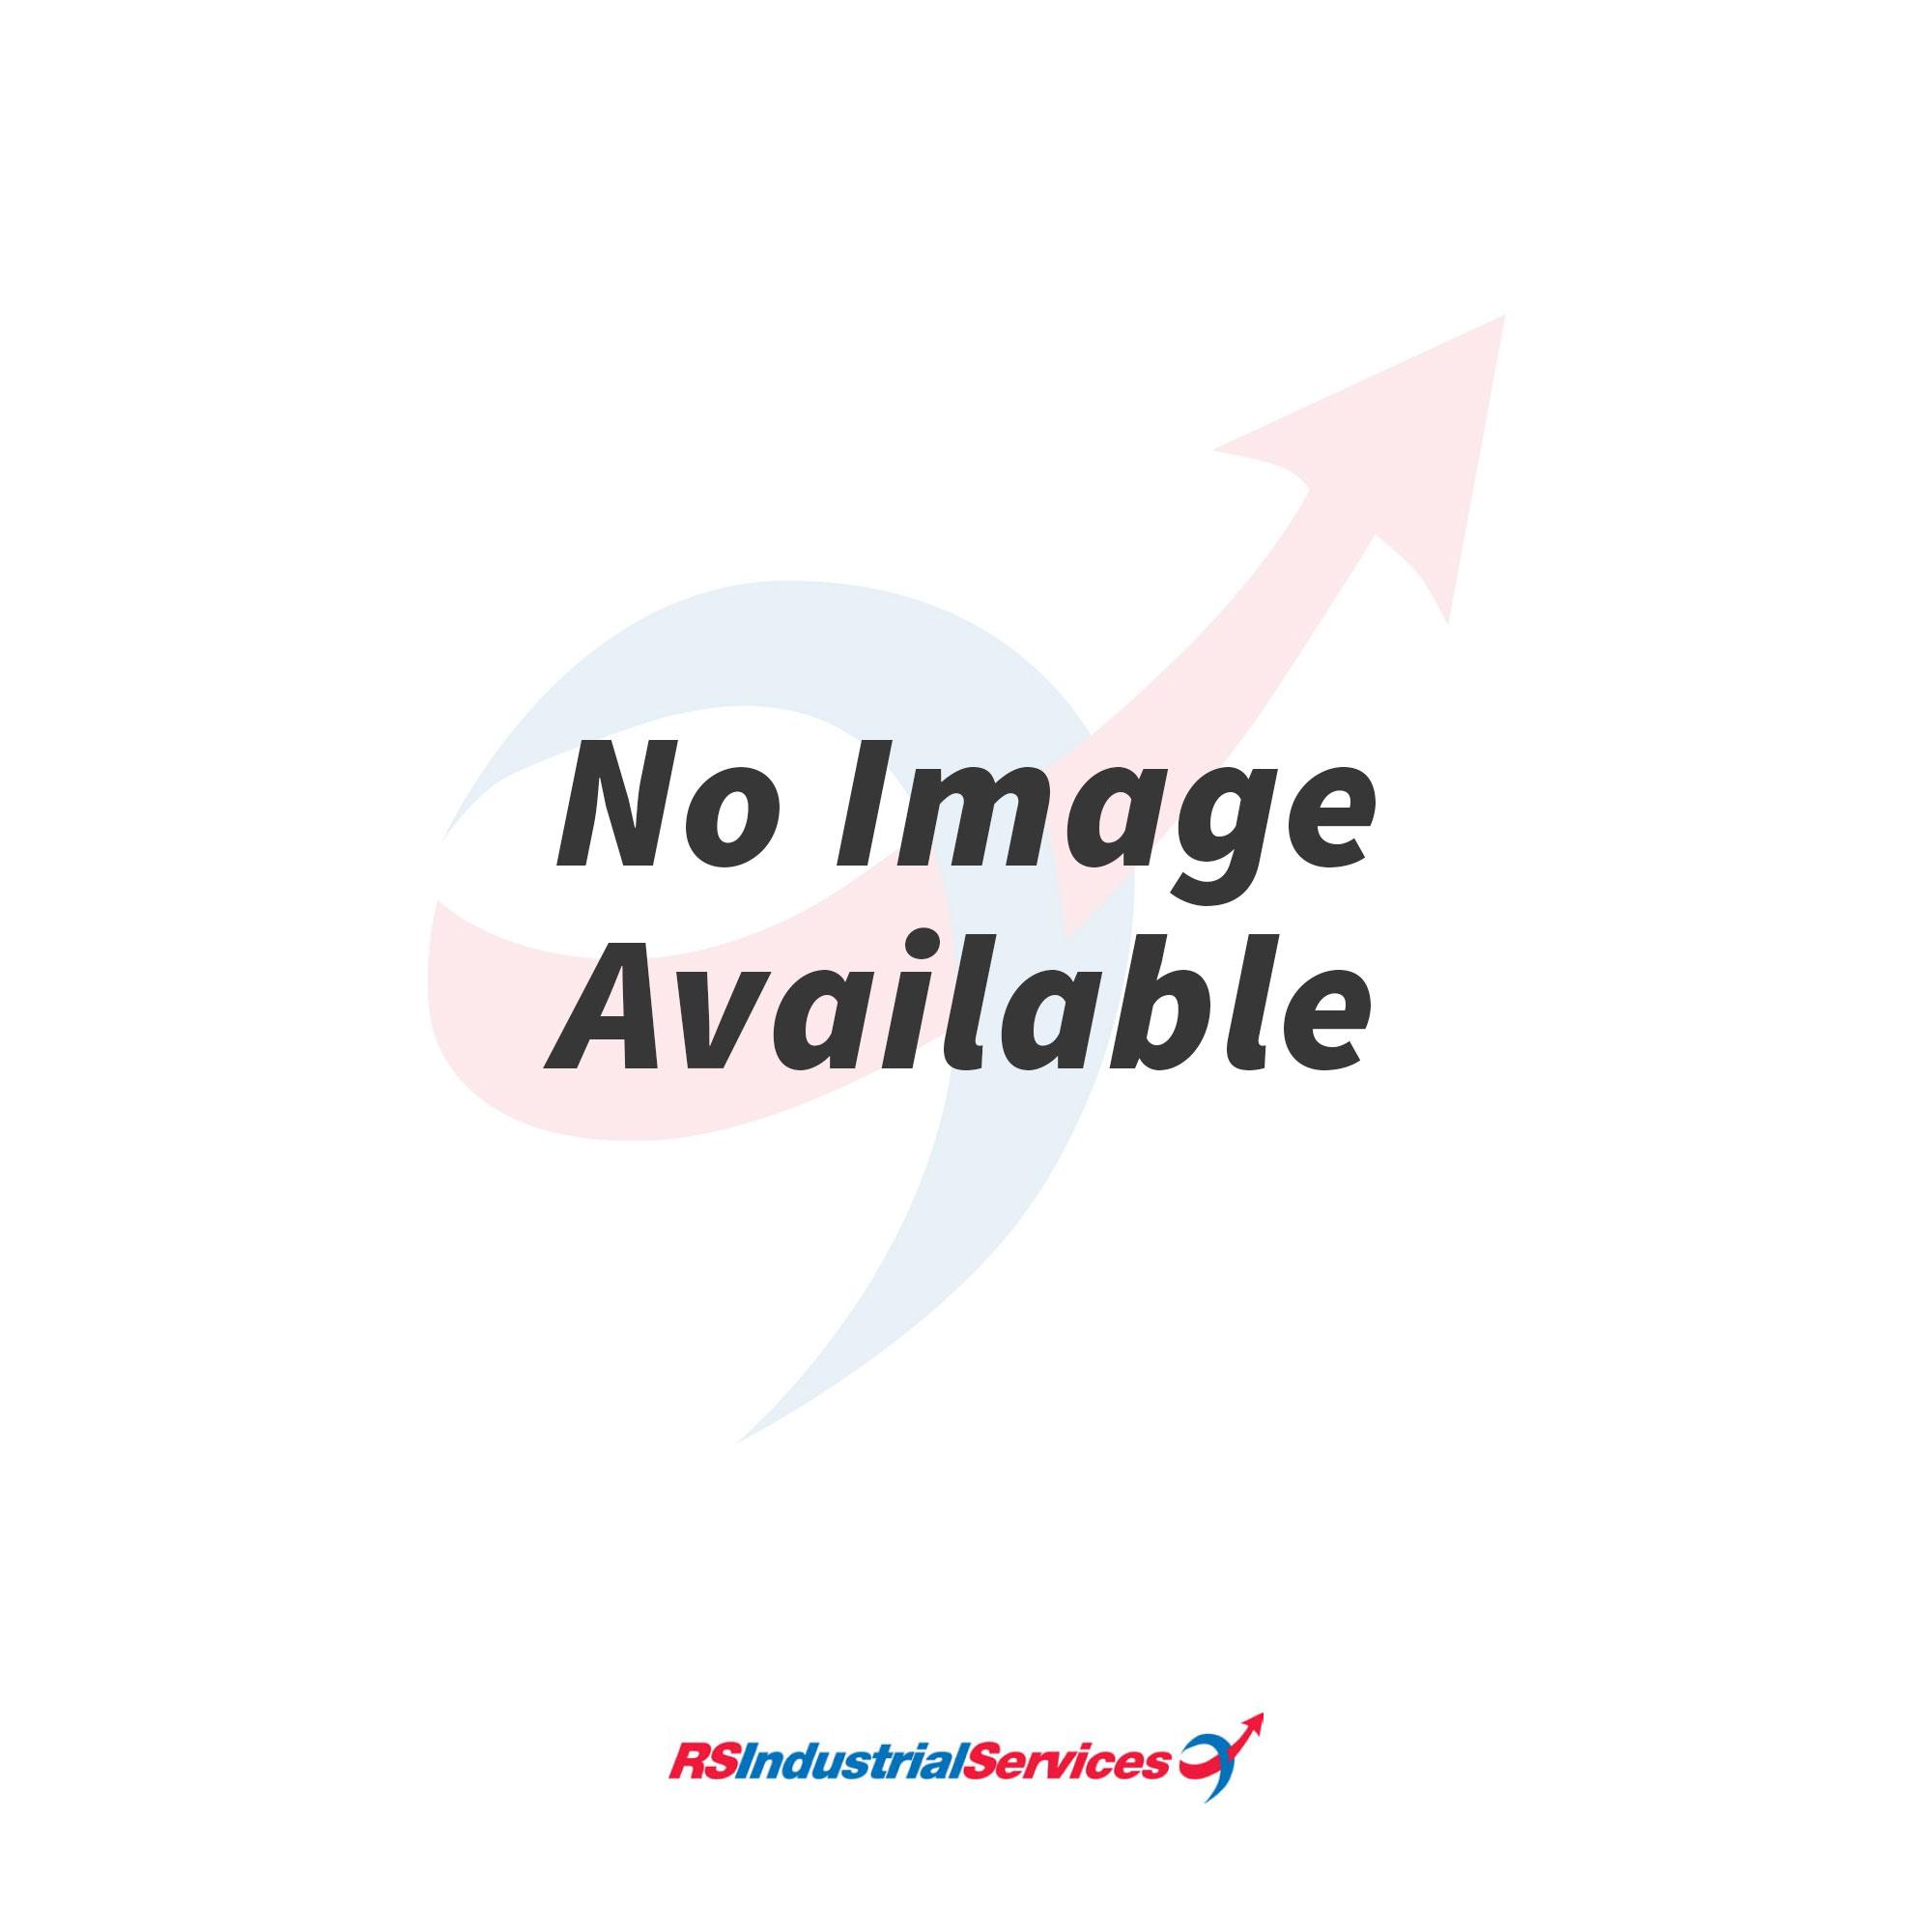 Codipro FE.DSR Female Double Swivel Ring UNC Thread